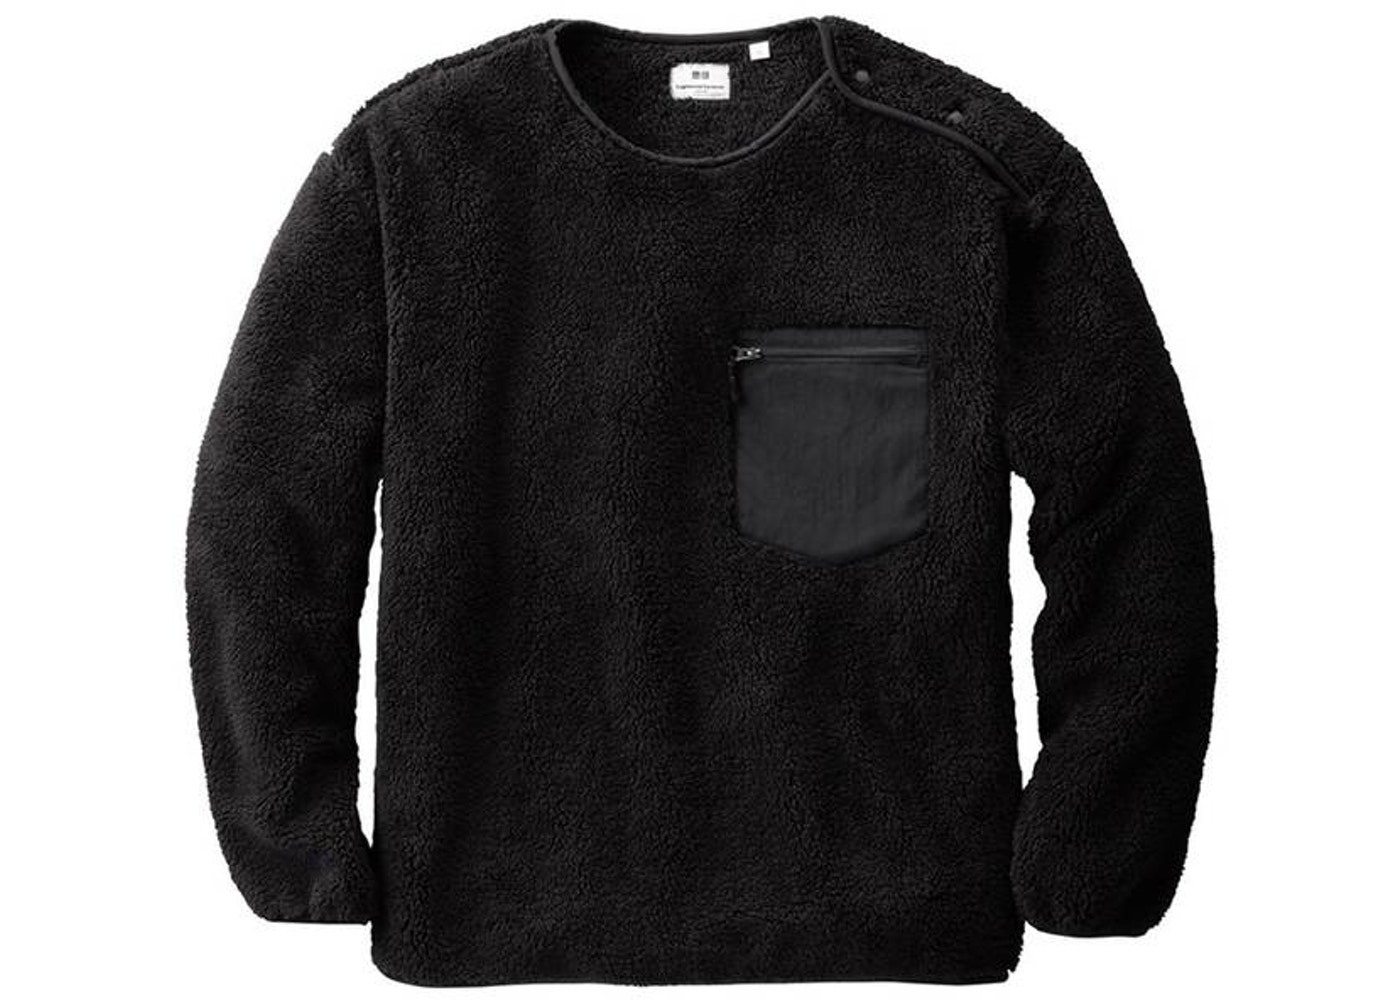 large assortment wholesale price better price Uniqlo x Engineered Garments Fleece Pullover Black